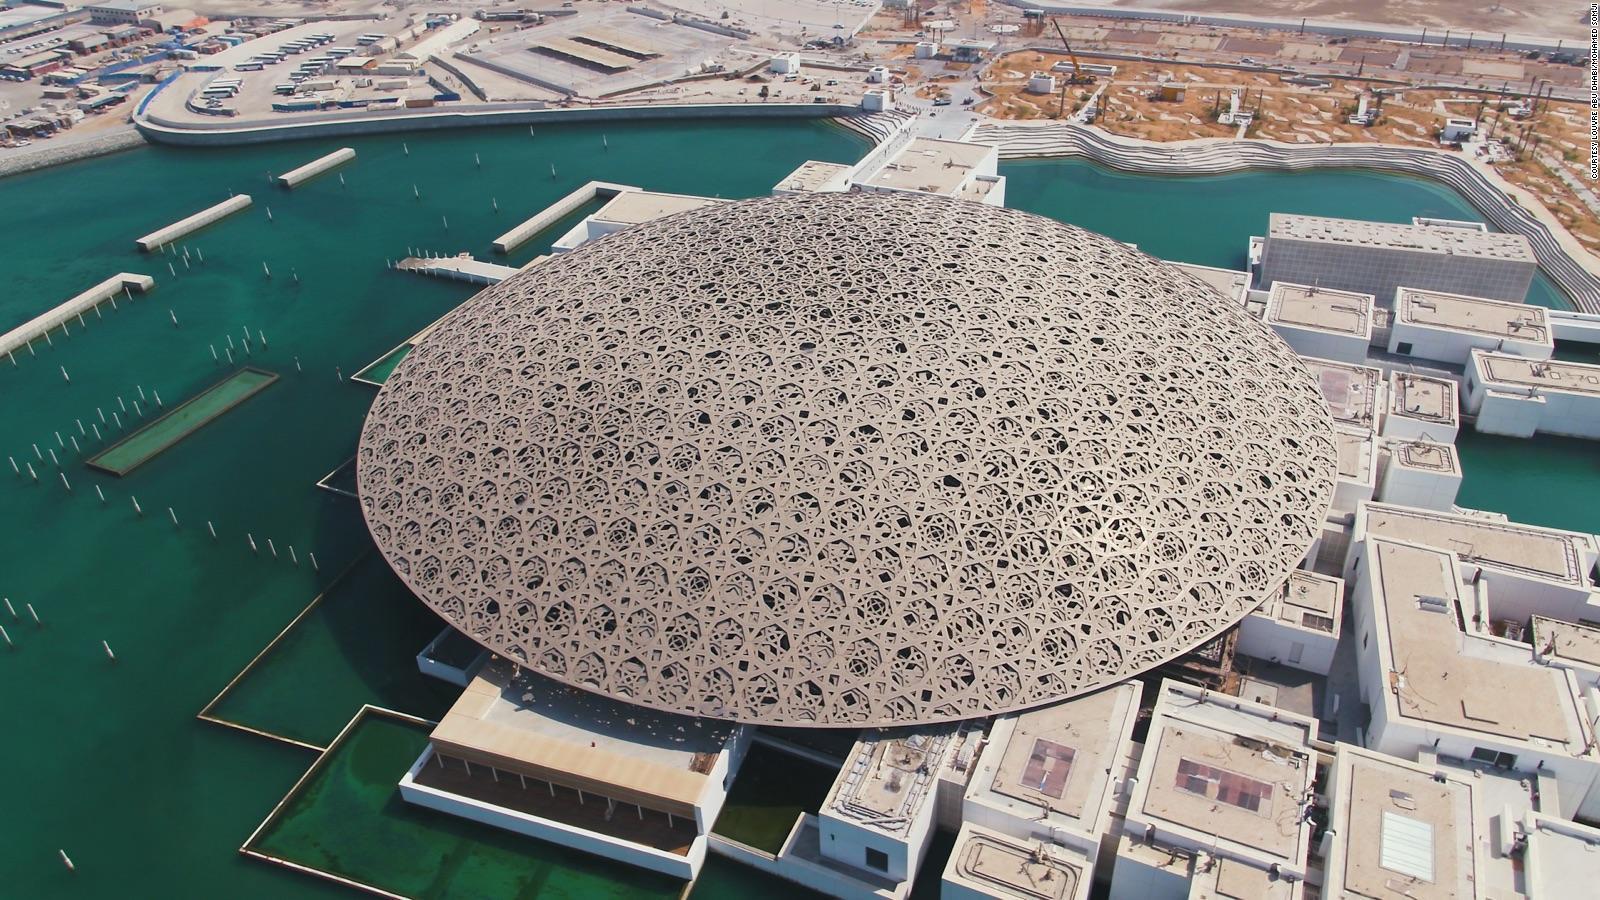 Louvre Abu Dhabi.jpg